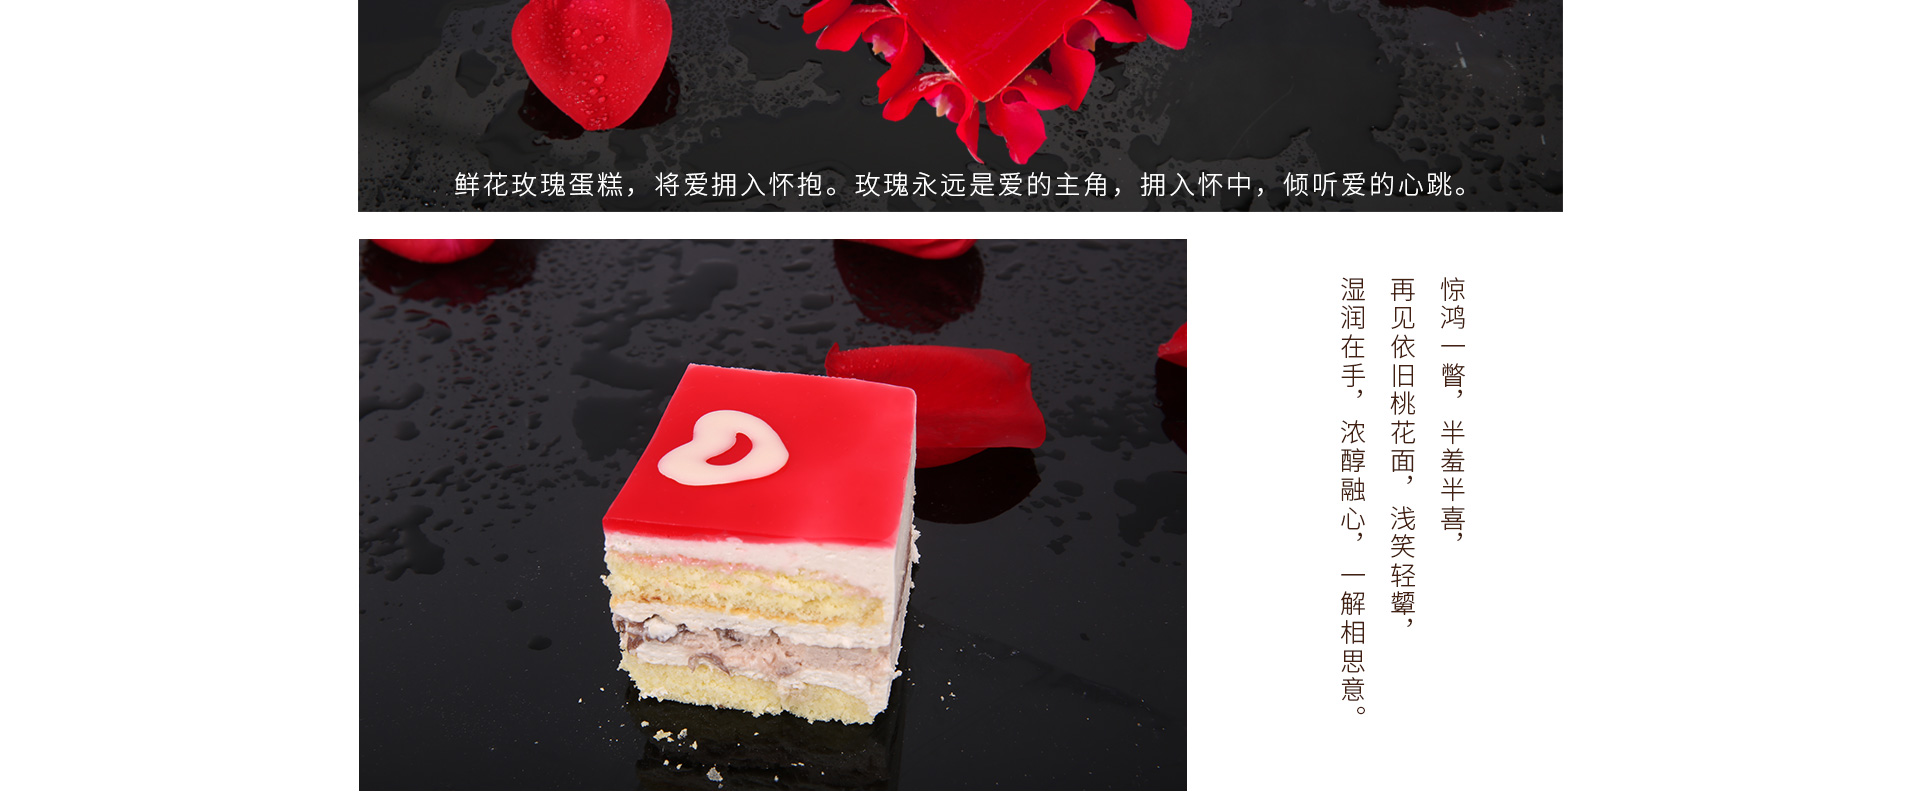 ebeecake小蜜蜂蛋糕  热恋|玫瑰慕斯蛋糕